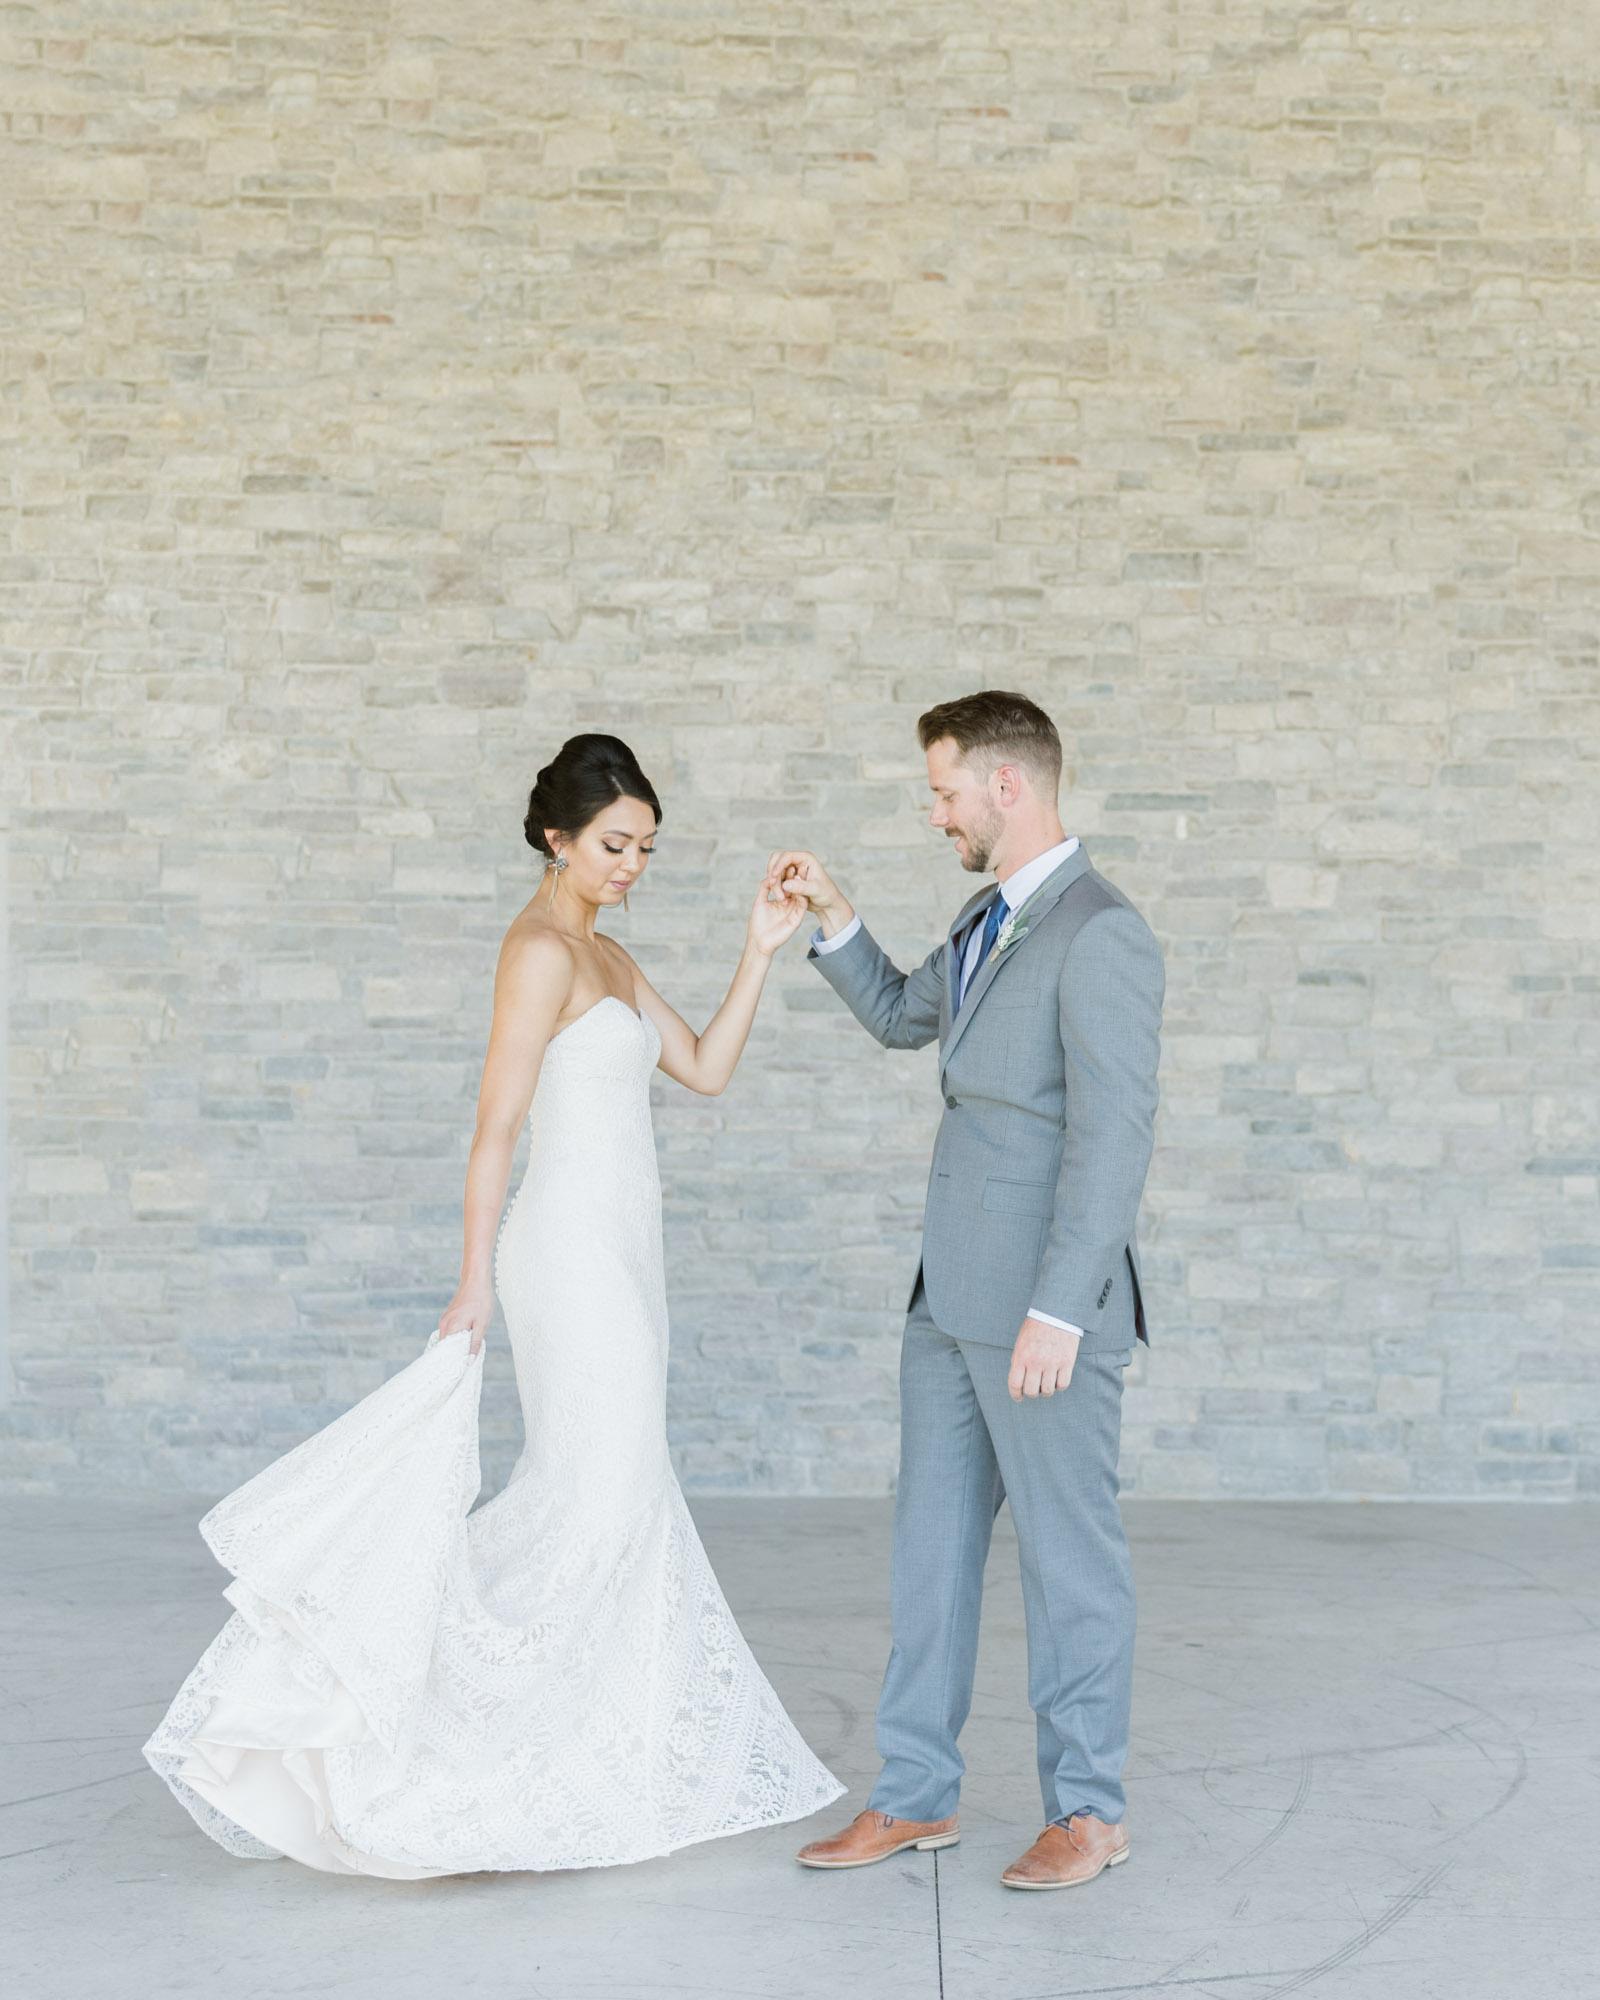 Gavyn-Taylor-Photo_Woolen-Mills-Wedding (31 of 143).jpg